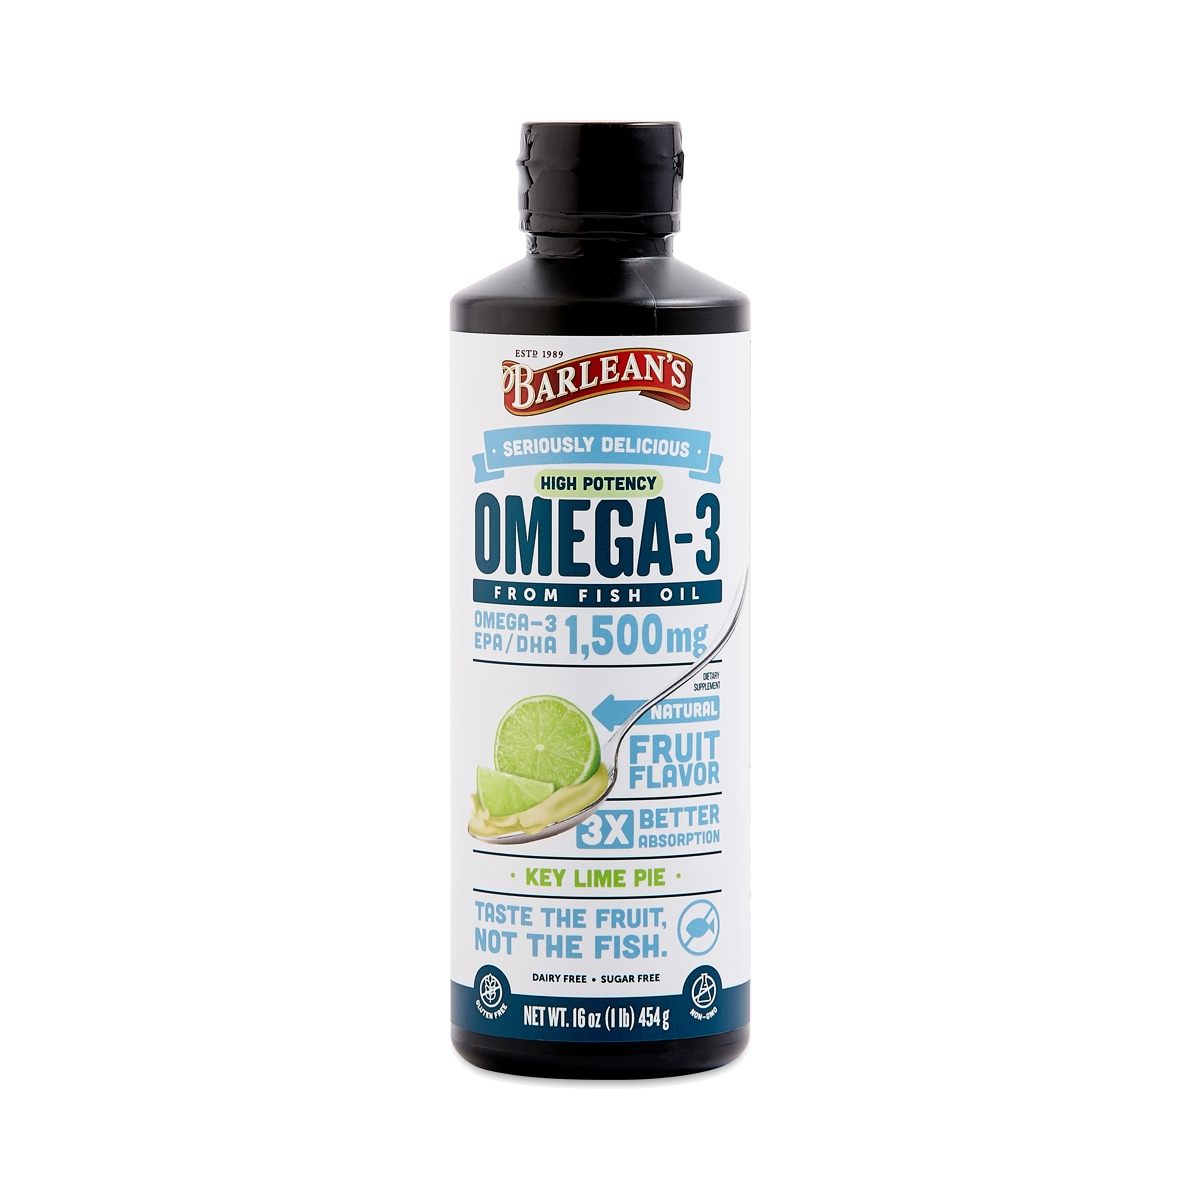 Barlean's Ultra High Potency Omega Swirl Fish Oil, Key Lime Pie 16 oz bottle